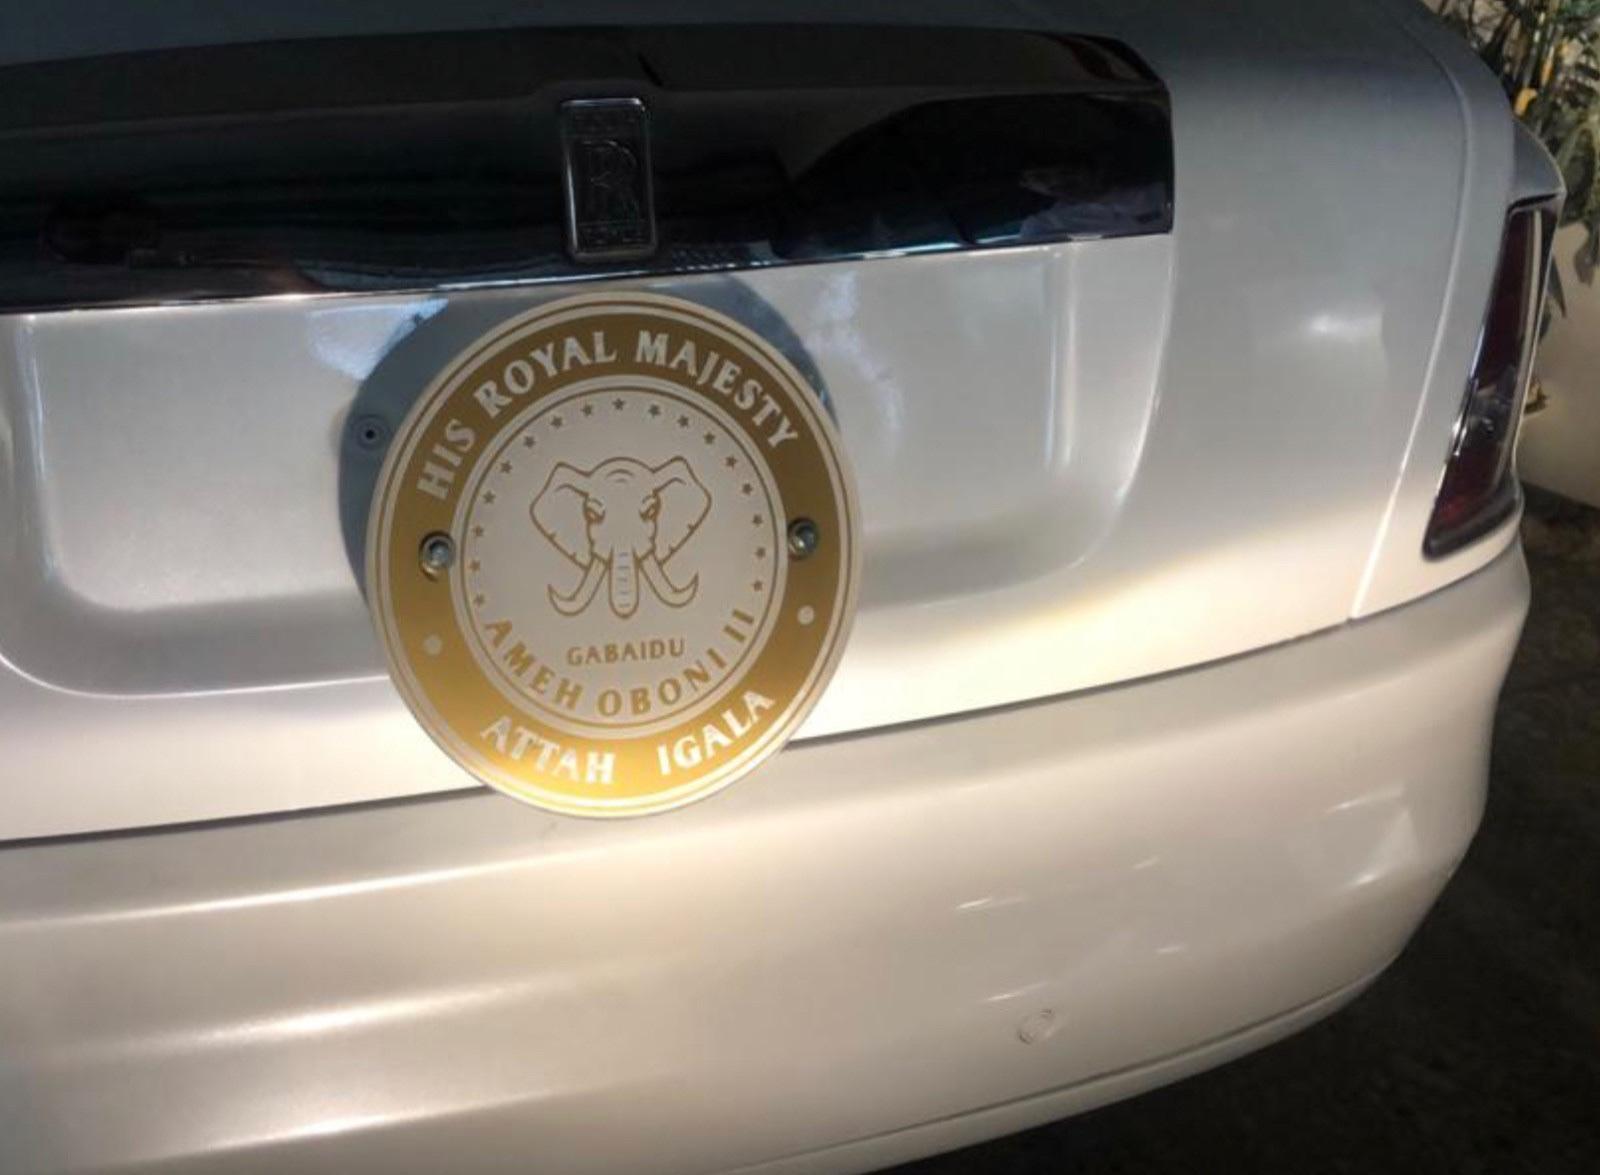 Kogi 2019: Traditional Ruler Receives White Rolls Royce Phantom (Photos) 9